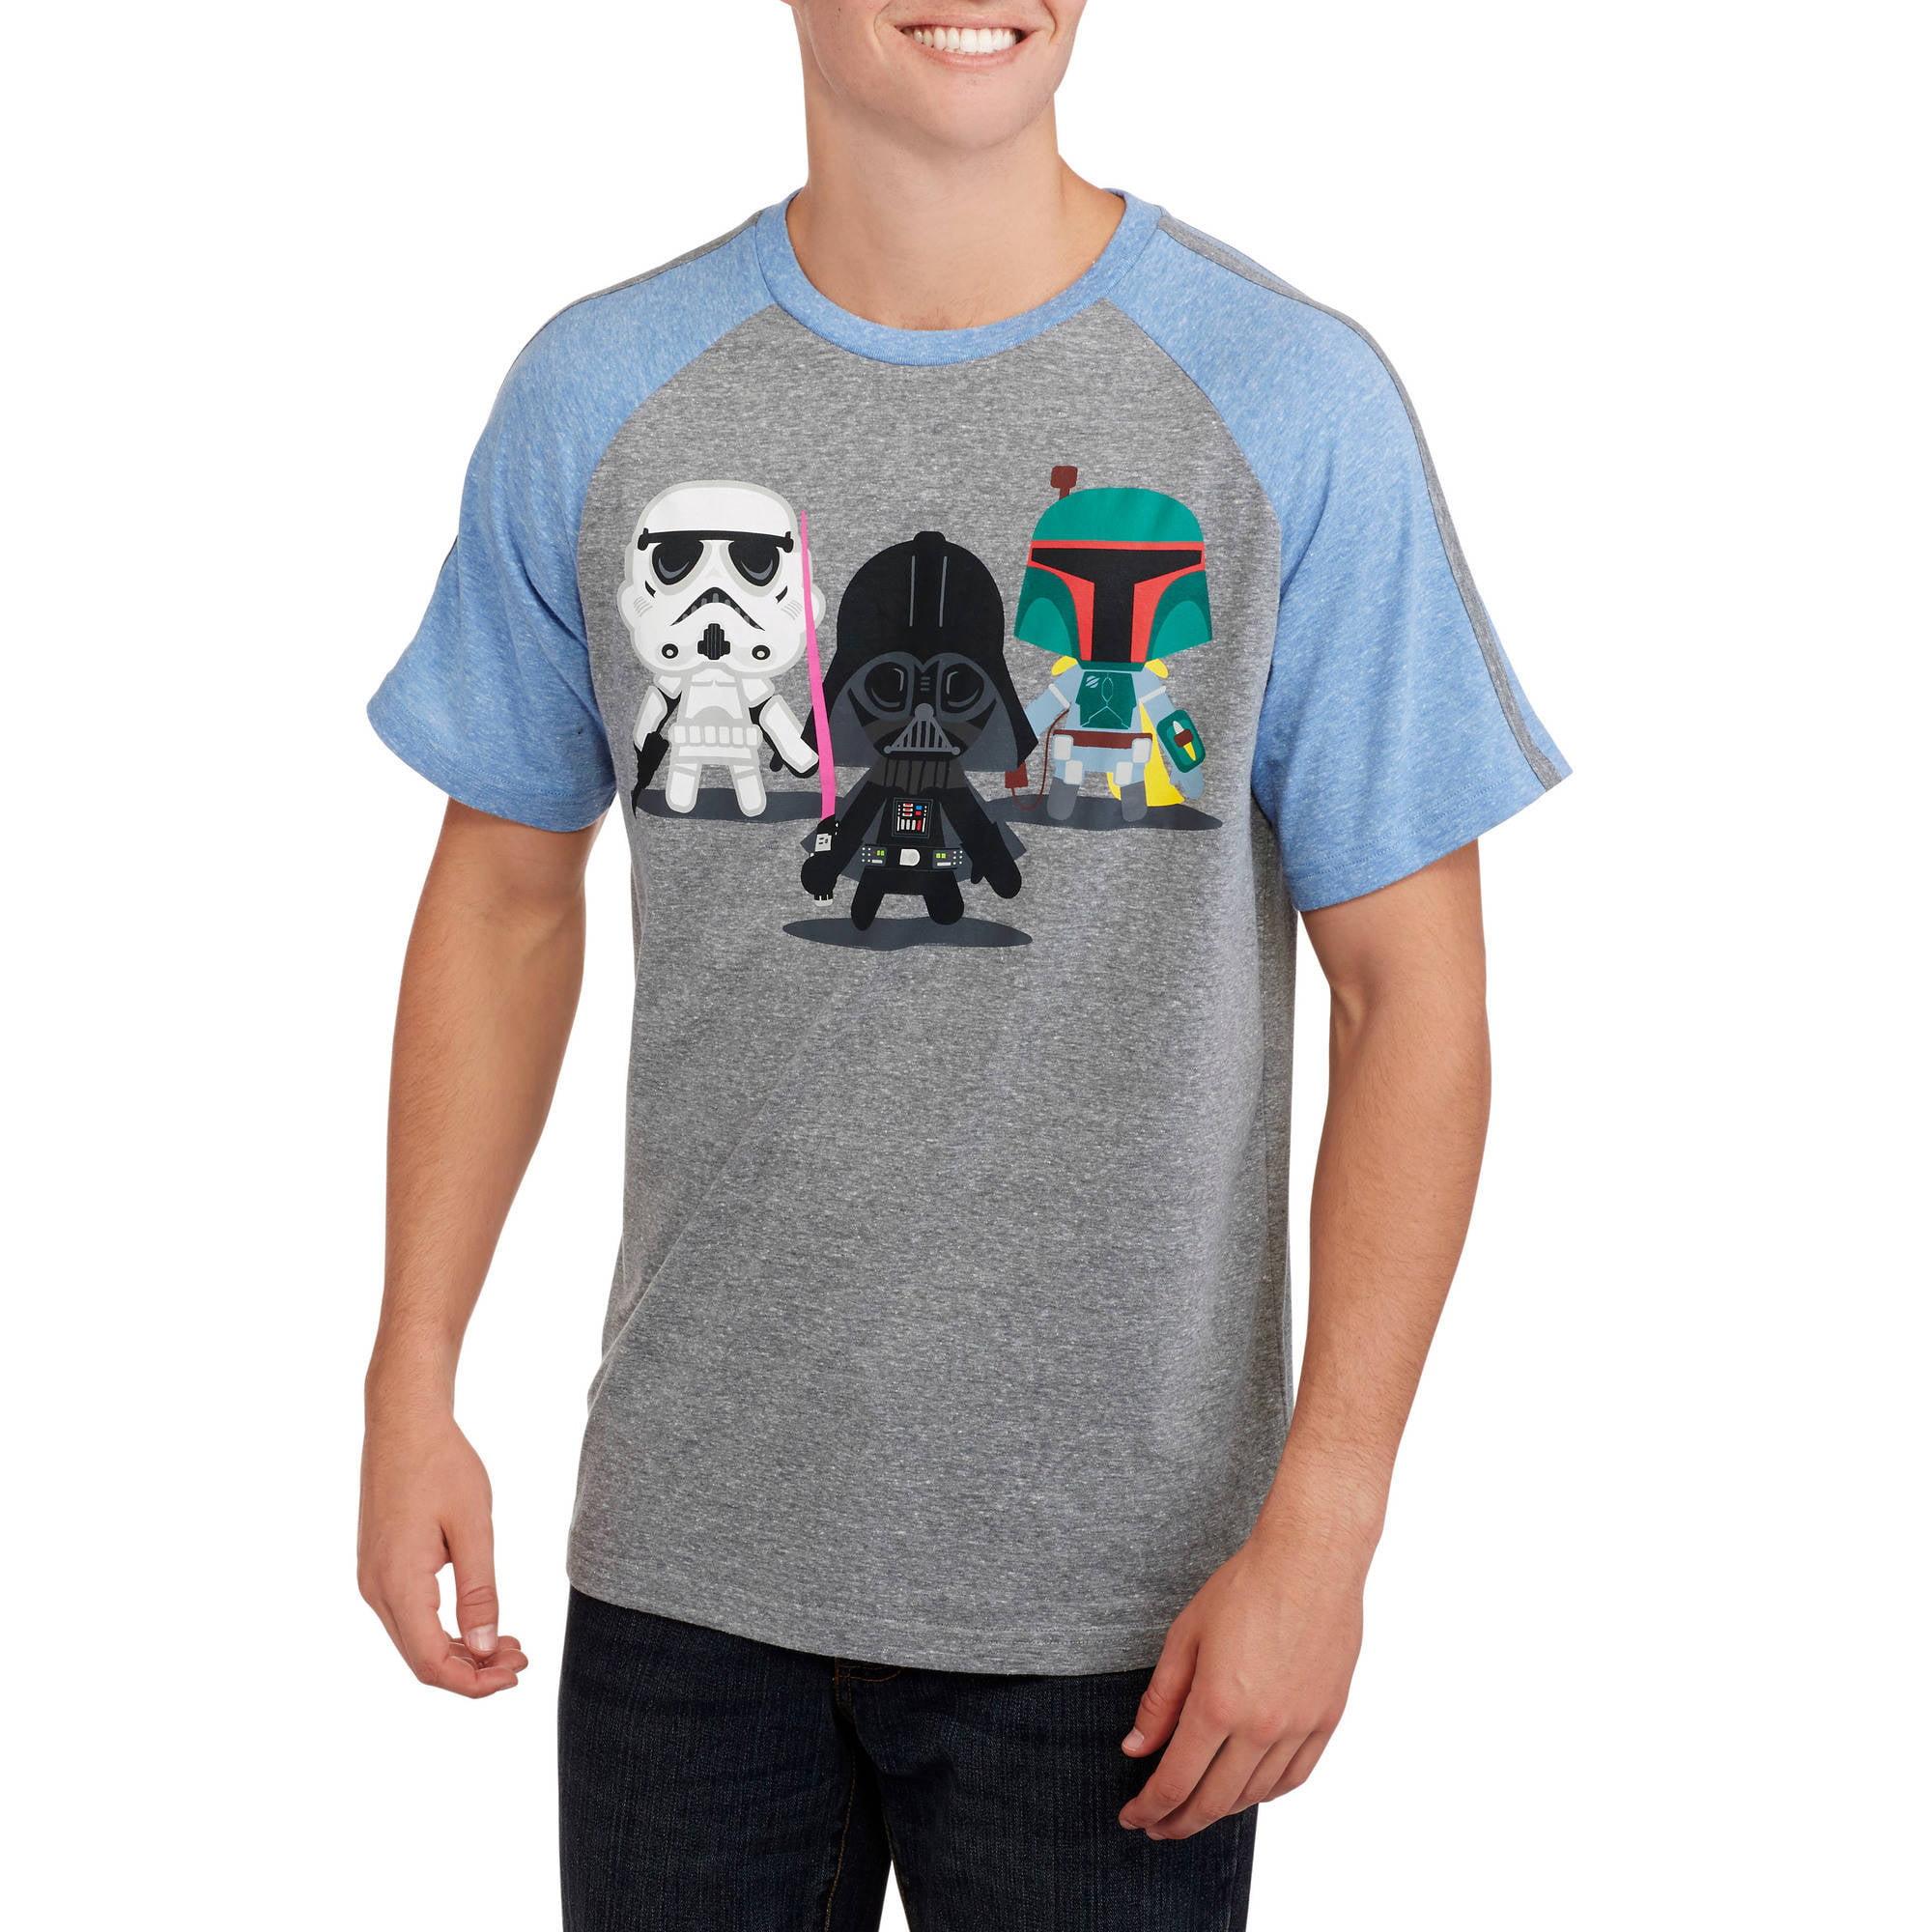 Star Wars Character Remix Big Men's Graphic Tee, 2XL